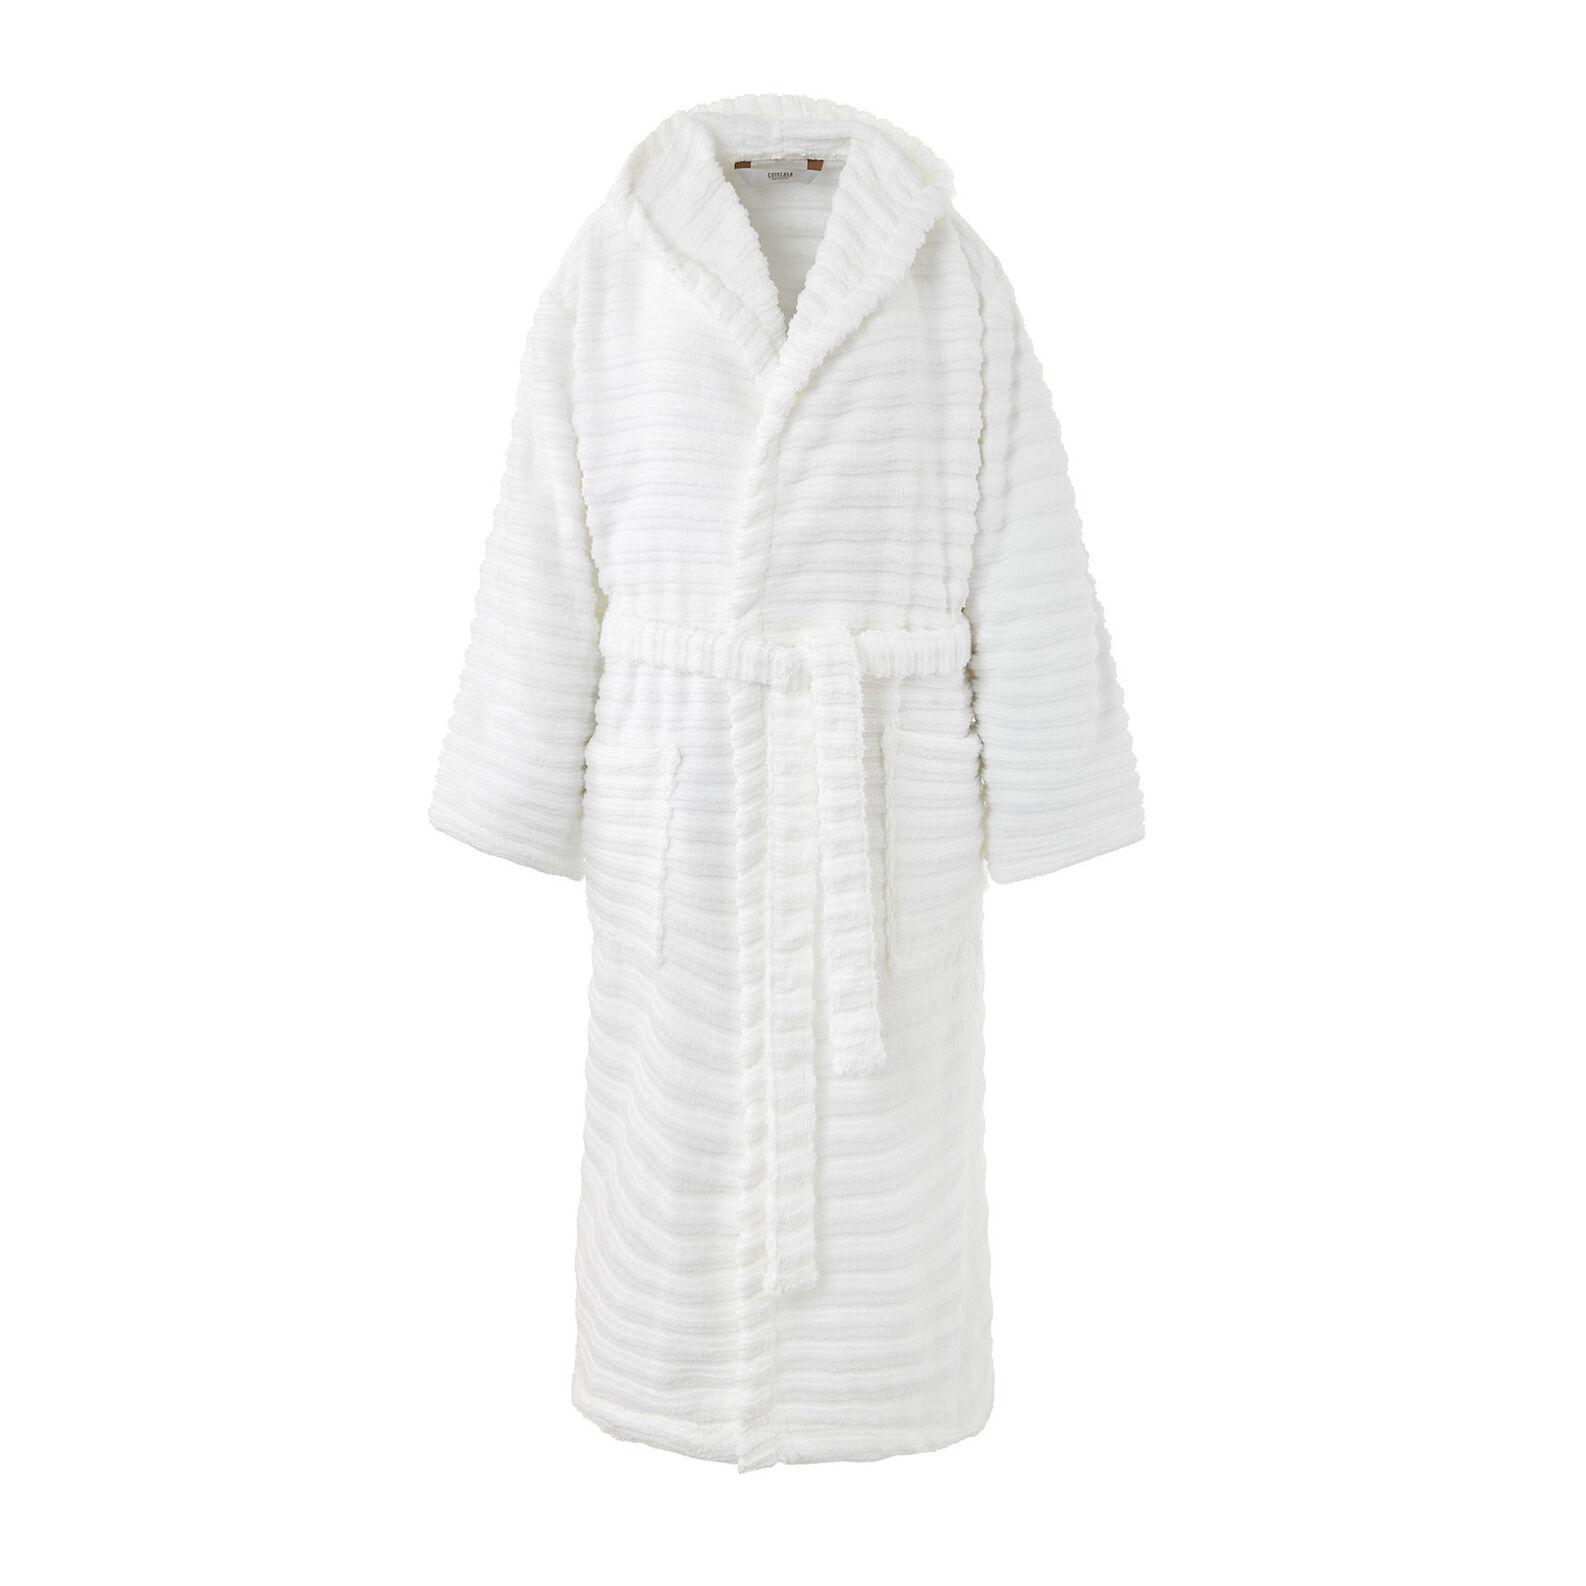 Solid color organic cotton bathrobe